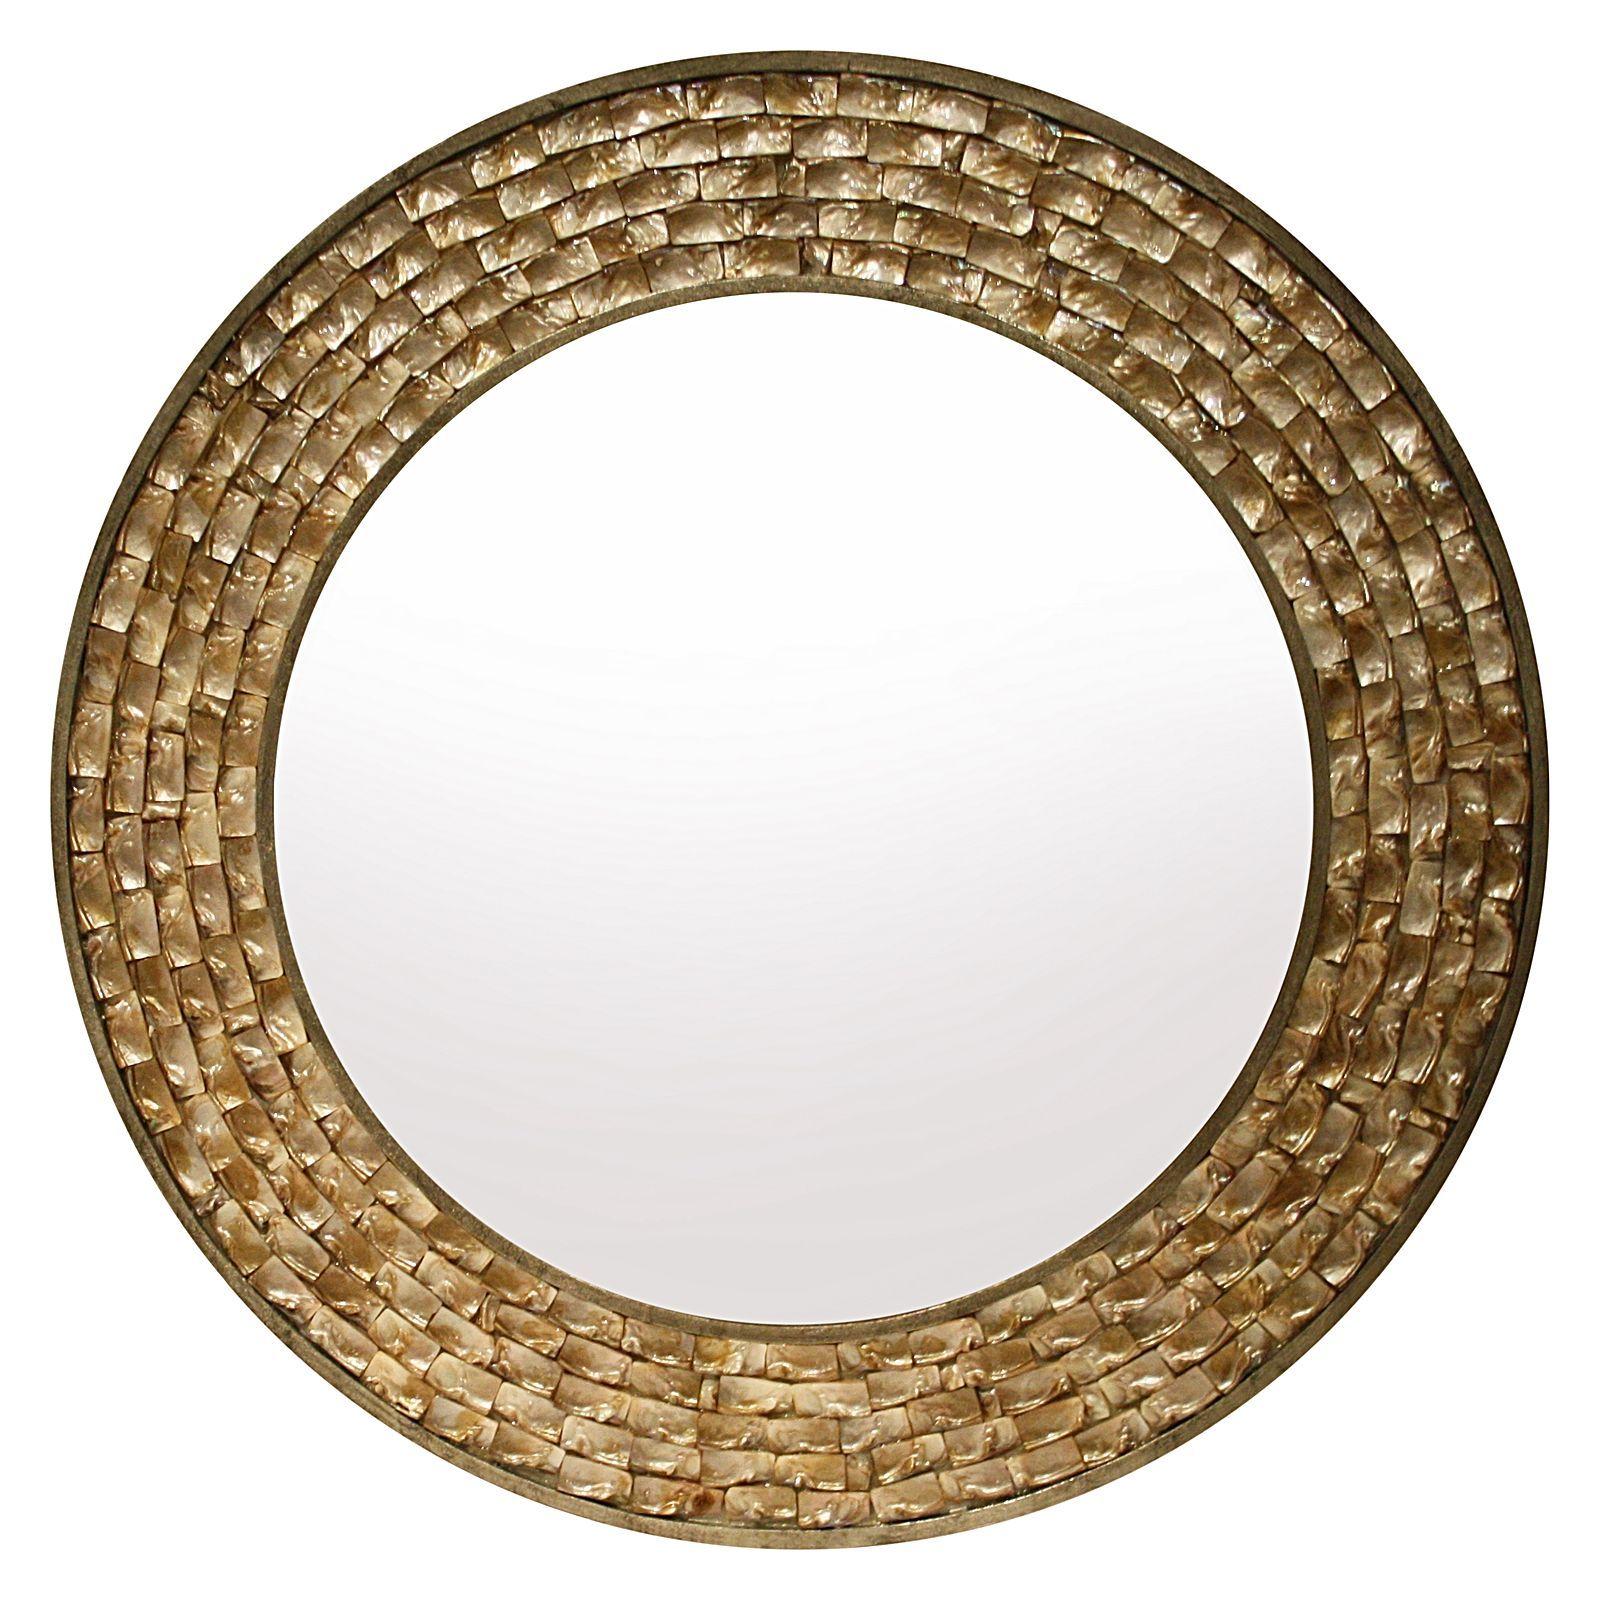 mirror zanui. perlos mirror, 91cm by swann imports | zanui mirror